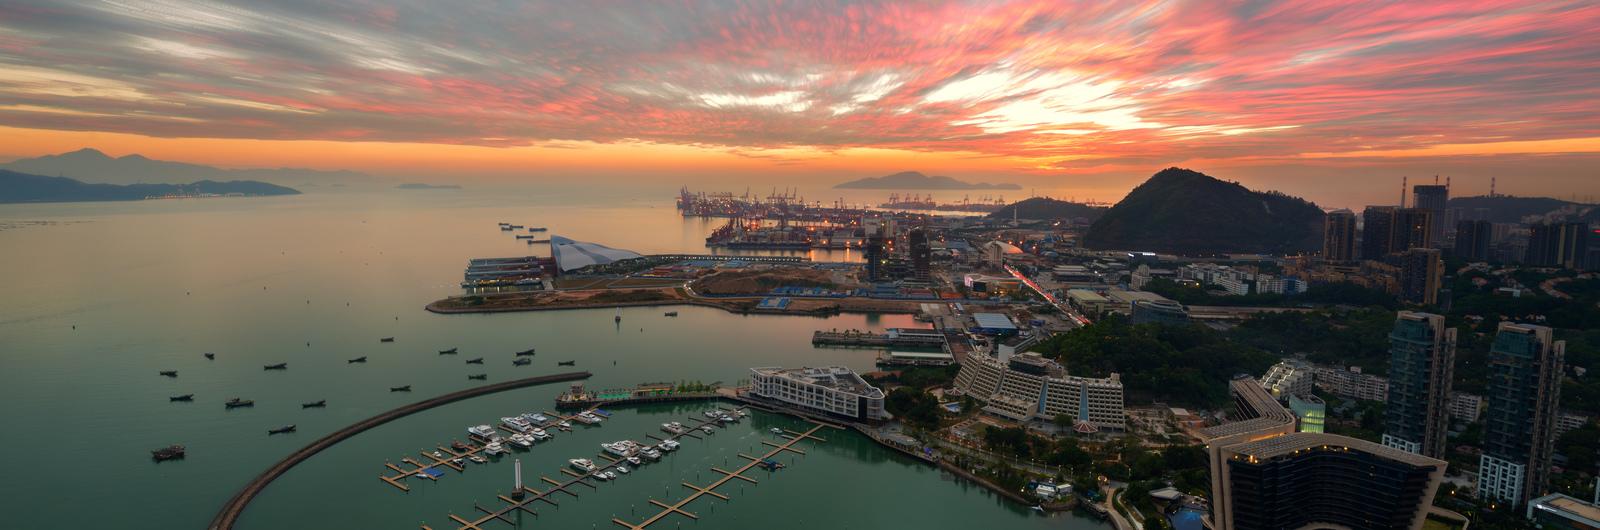 port au prince city header